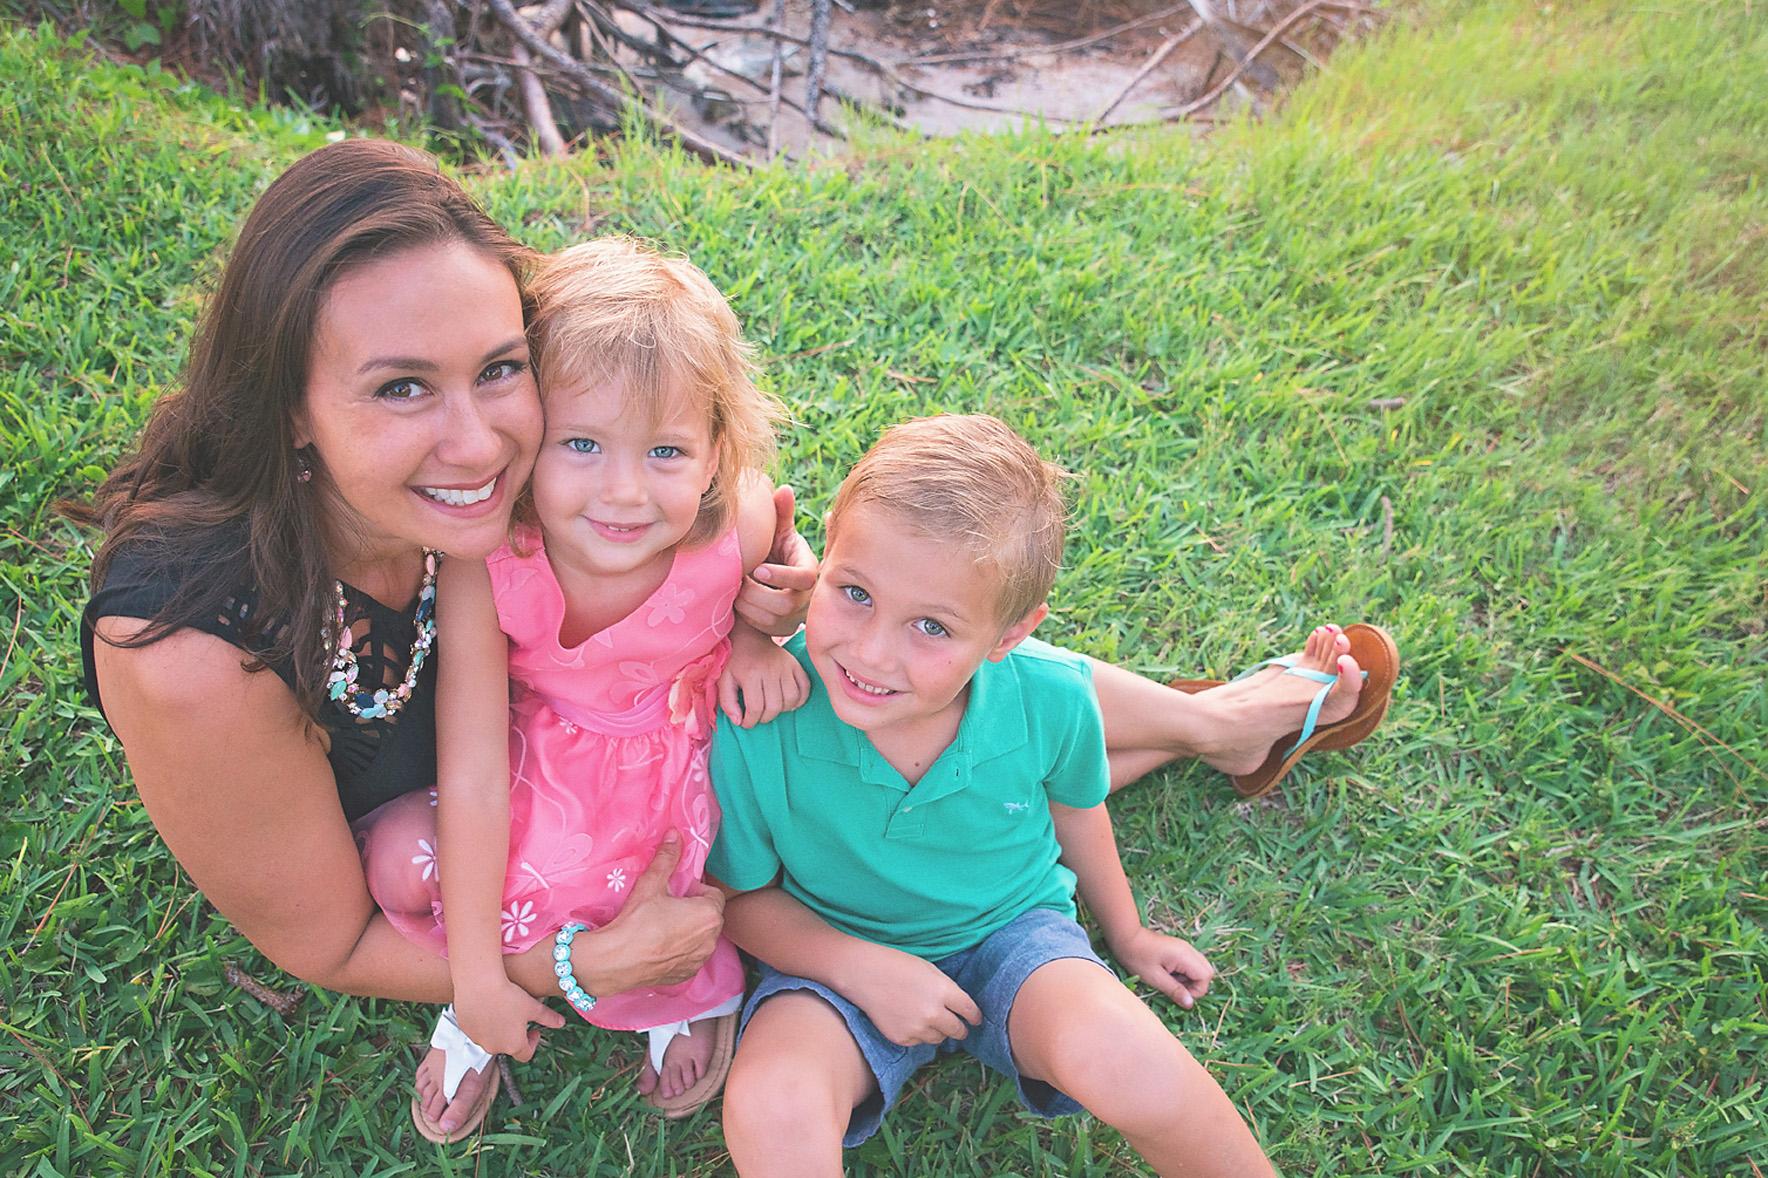 tampafamilyphotographer.jpg